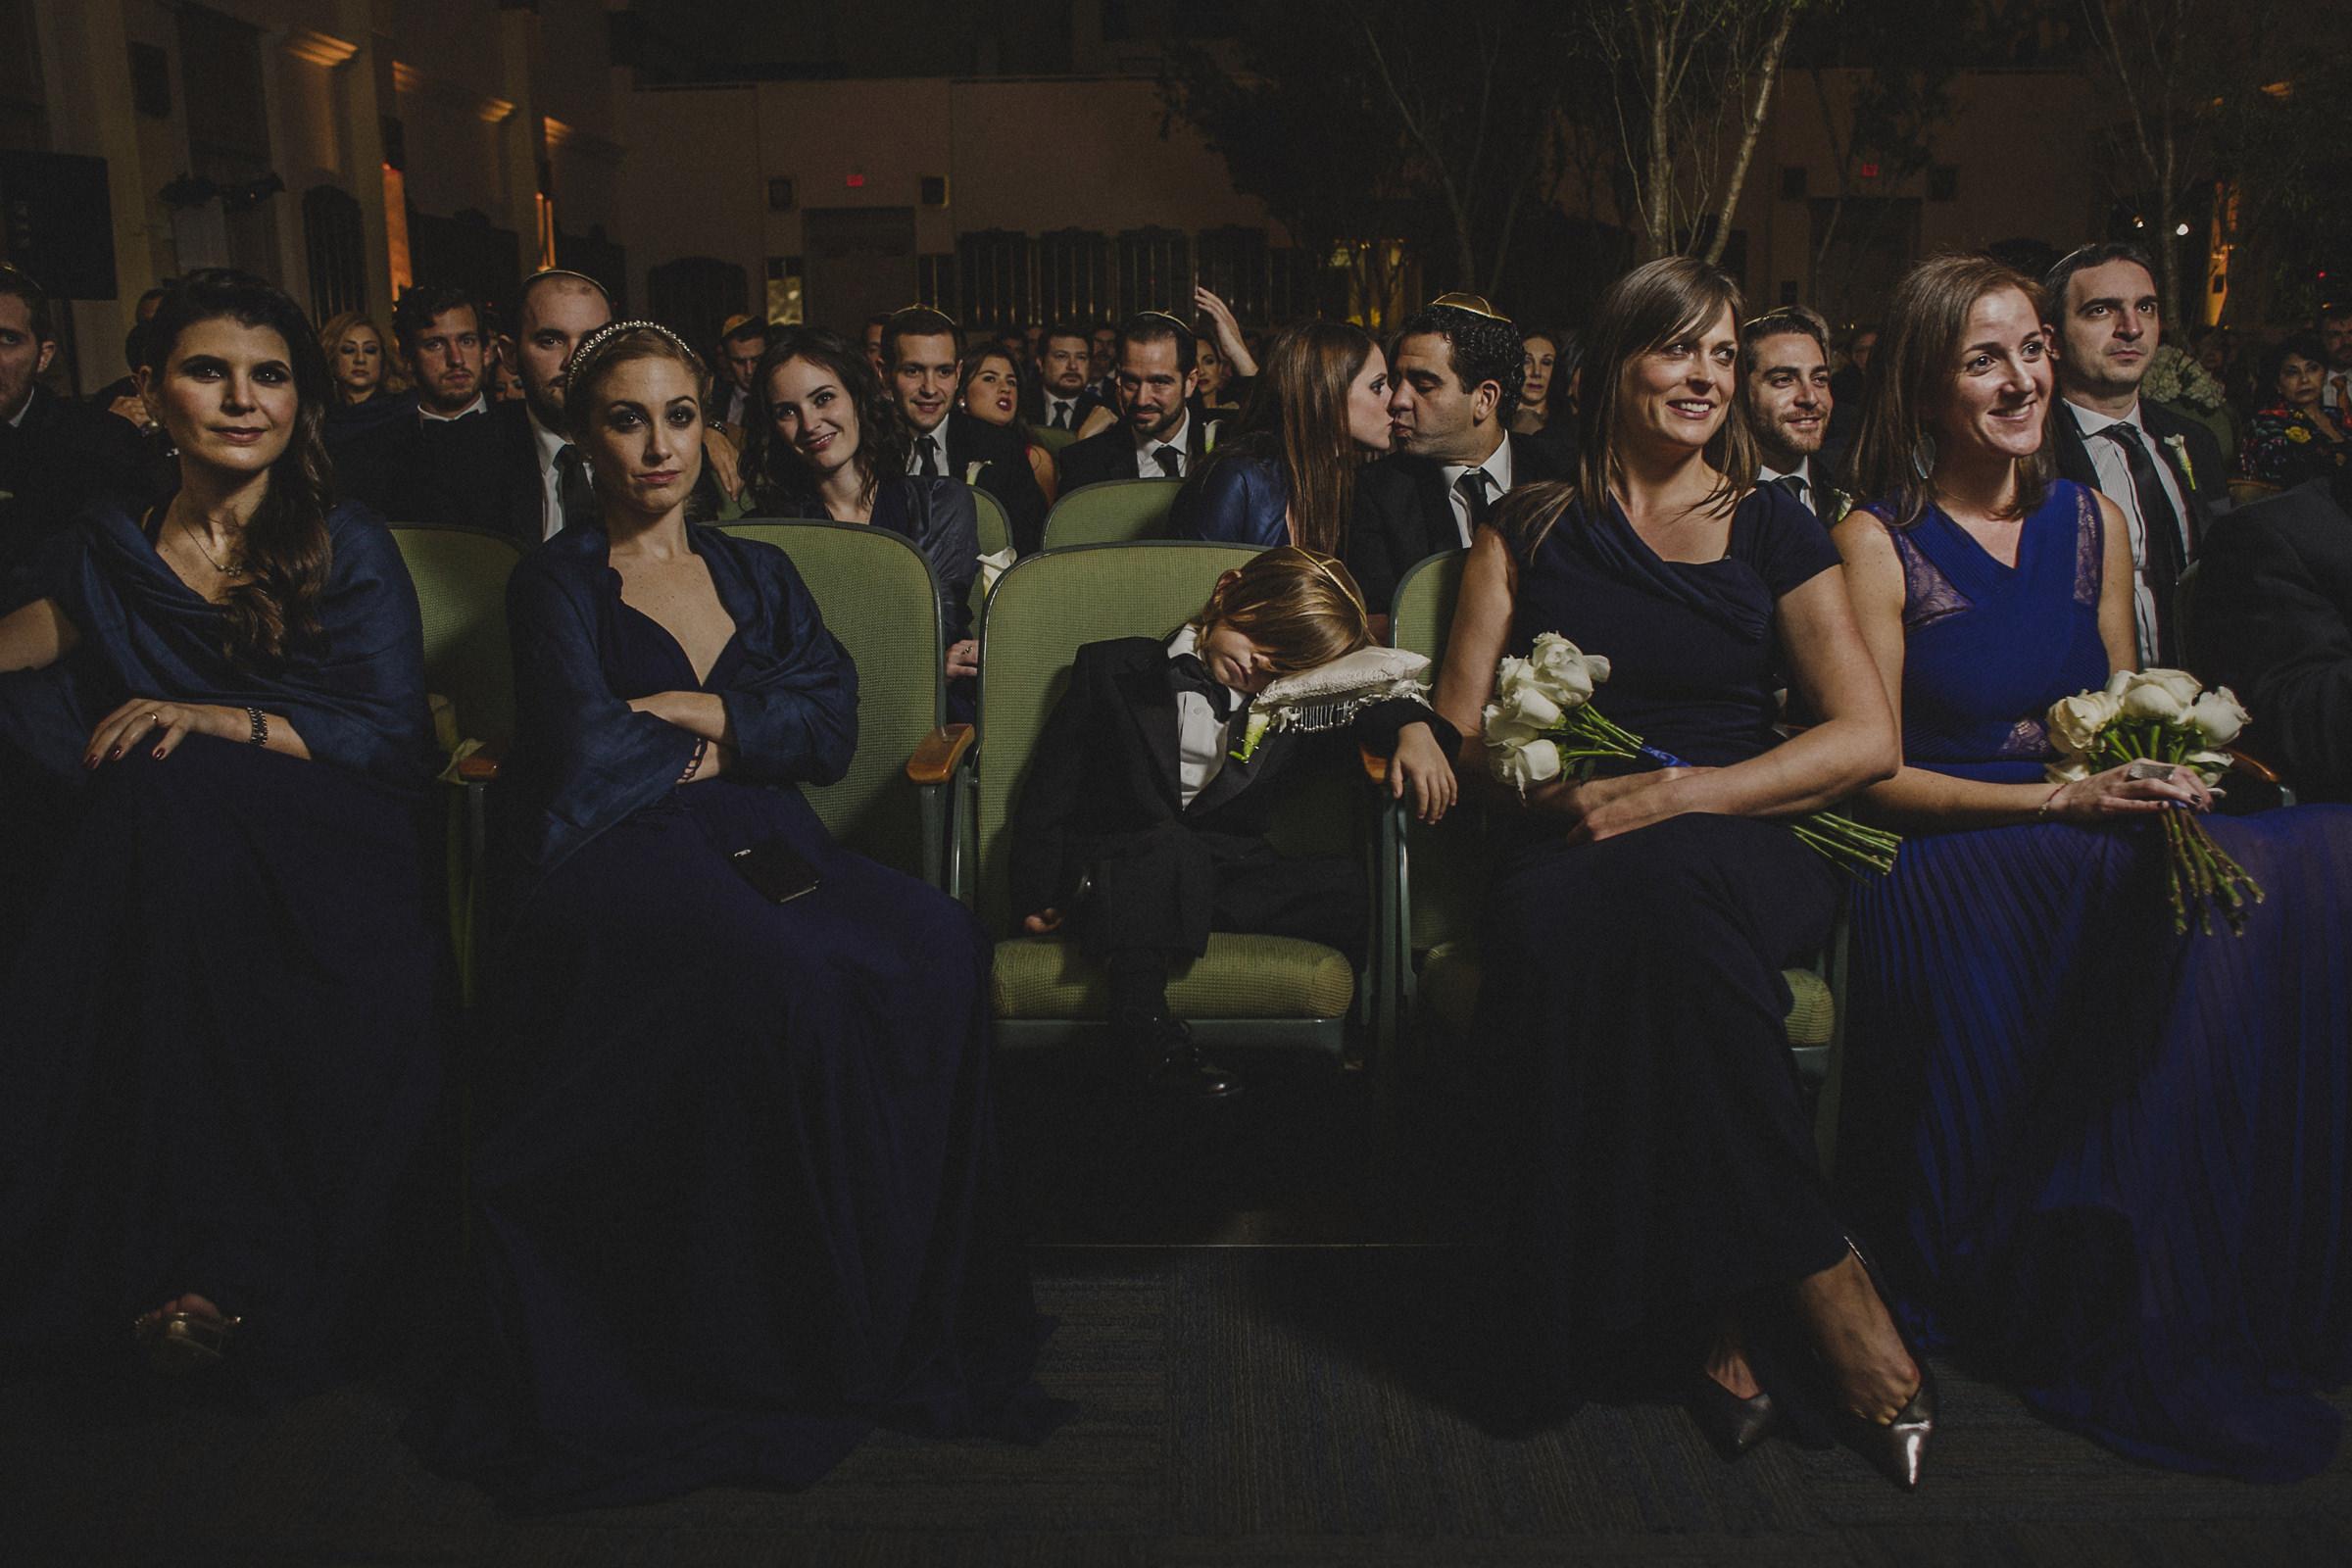 Ringbearer sleeps in front row of wedding ceremony - photo by El Marco Rojo